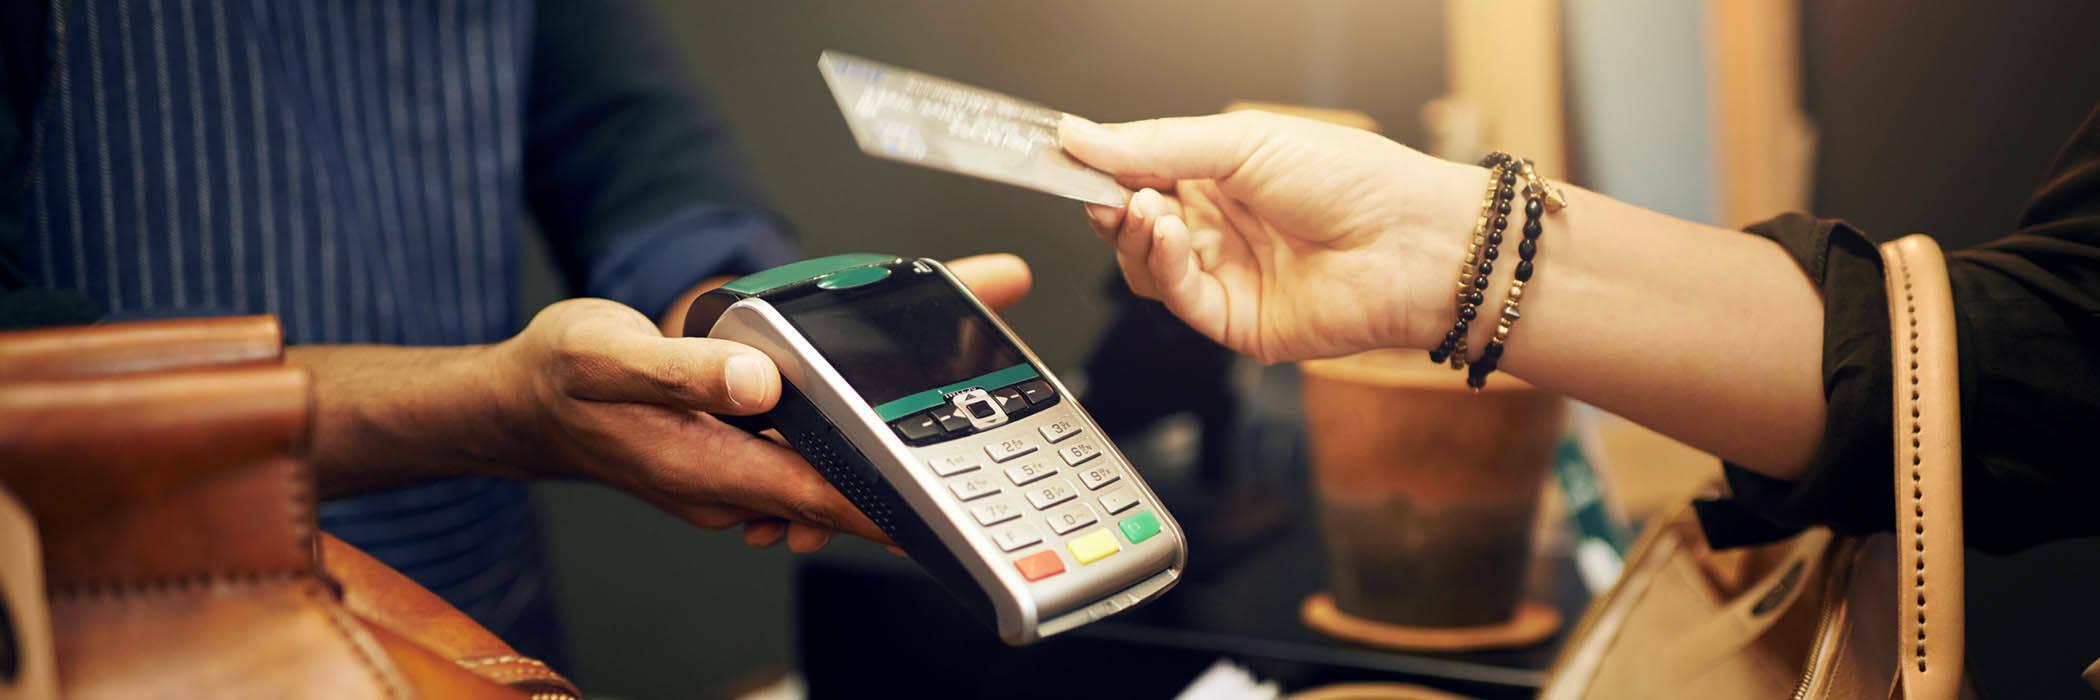 21may credit card fees reined in hero